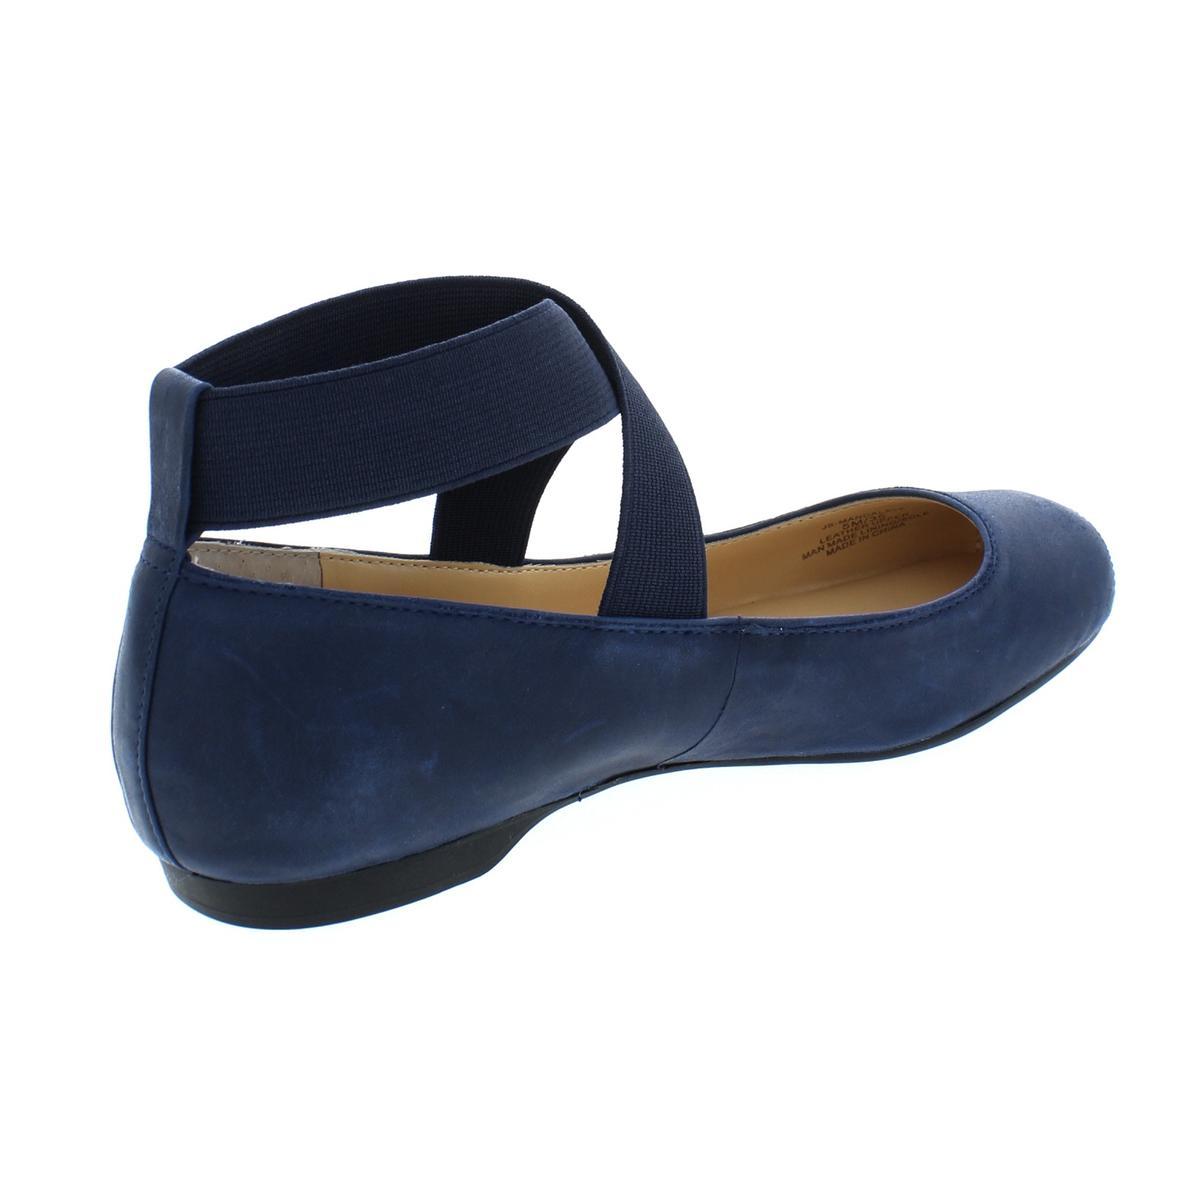 Jessica-Simpson-Women-039-s-Mandalaye-Square-Toe-Ankle-Wrap-Ballet-Flats thumbnail 17